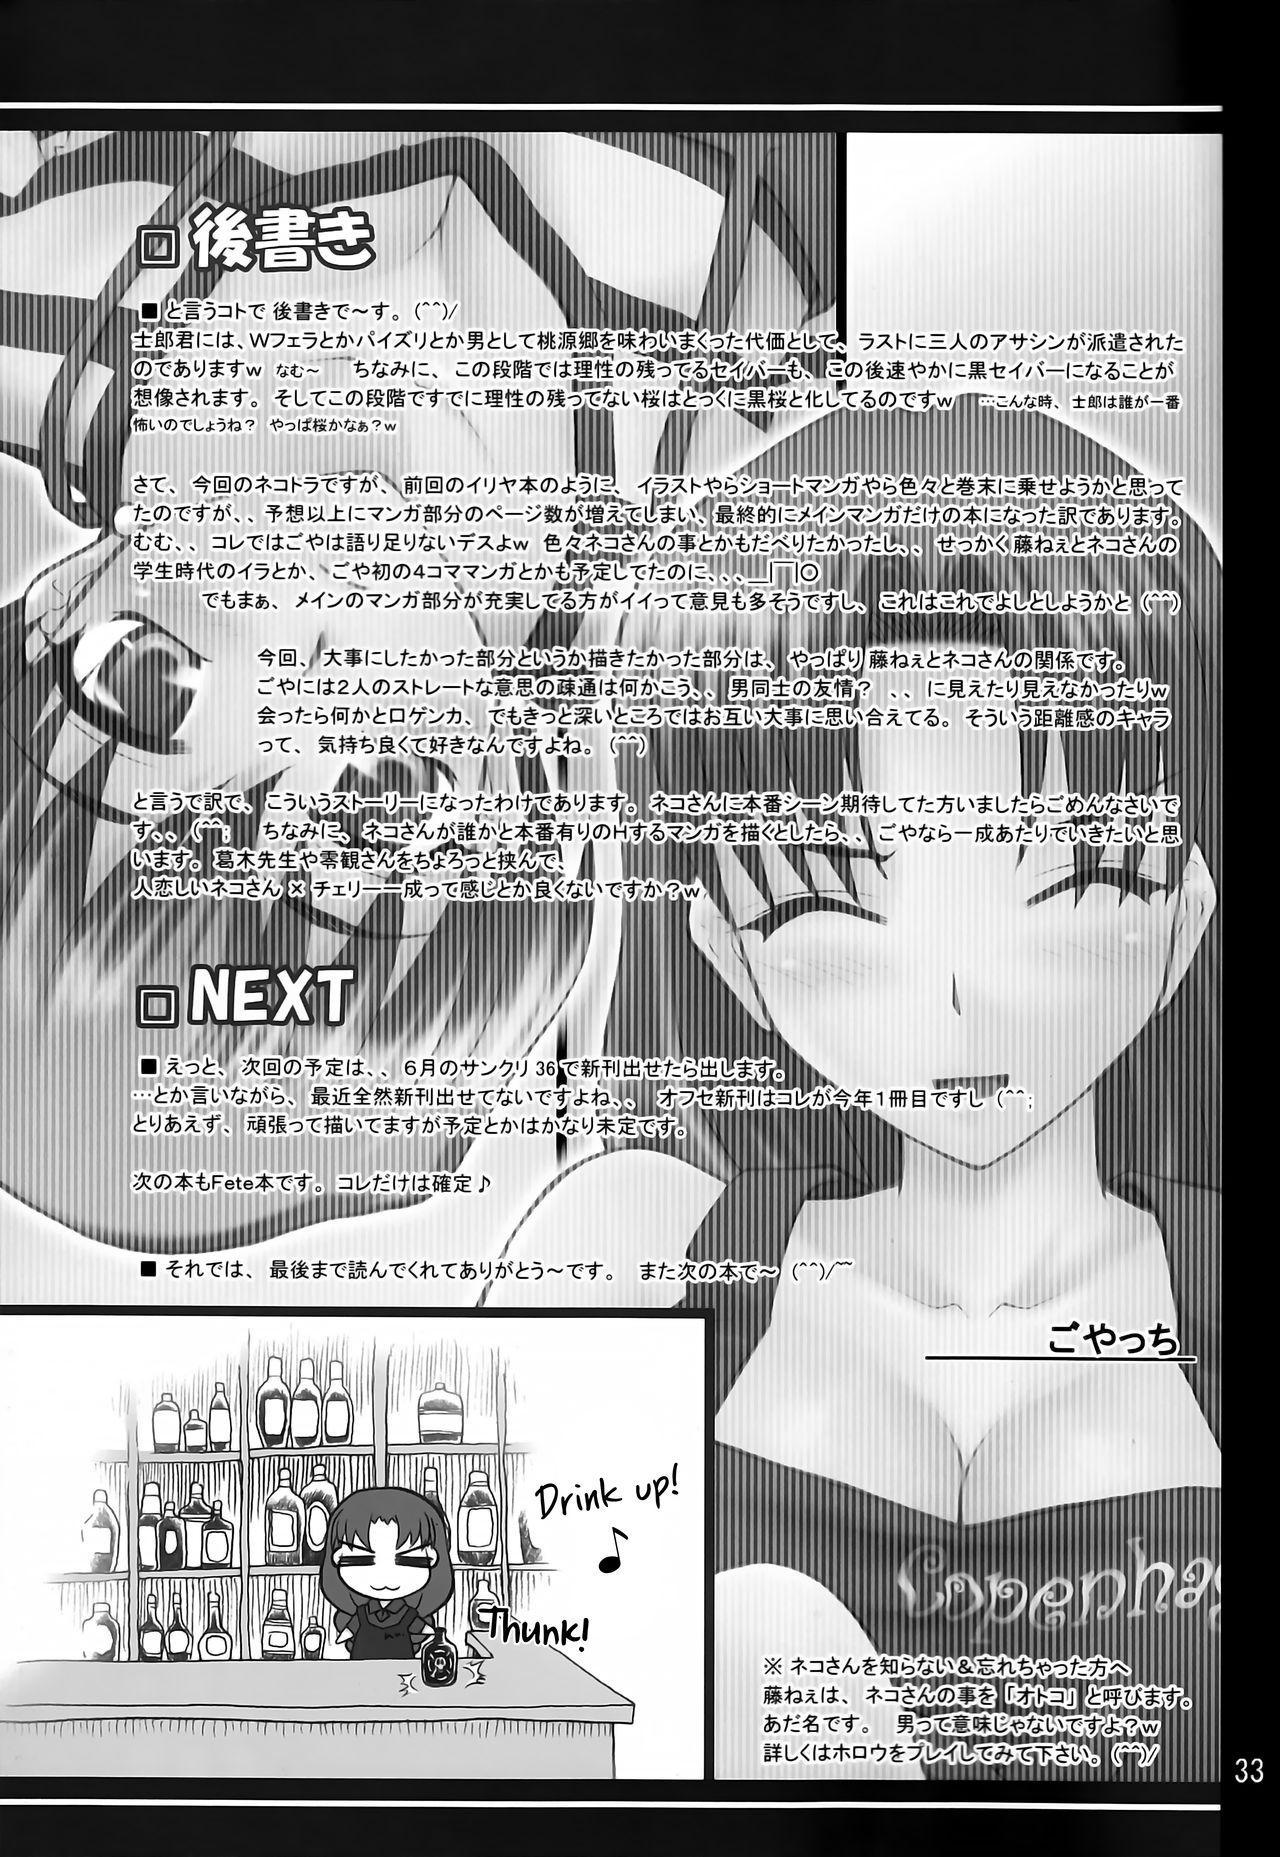 (COMIC1) [PURIMONO (Goyac)] Nekotora -Nekoka no Onee-san wa Suki desu ka?- | Cat Tiger: Do you like feline big sisters? Fate/Stay Afternoon (Fate/stay night) [English] [EHCOVE] 31